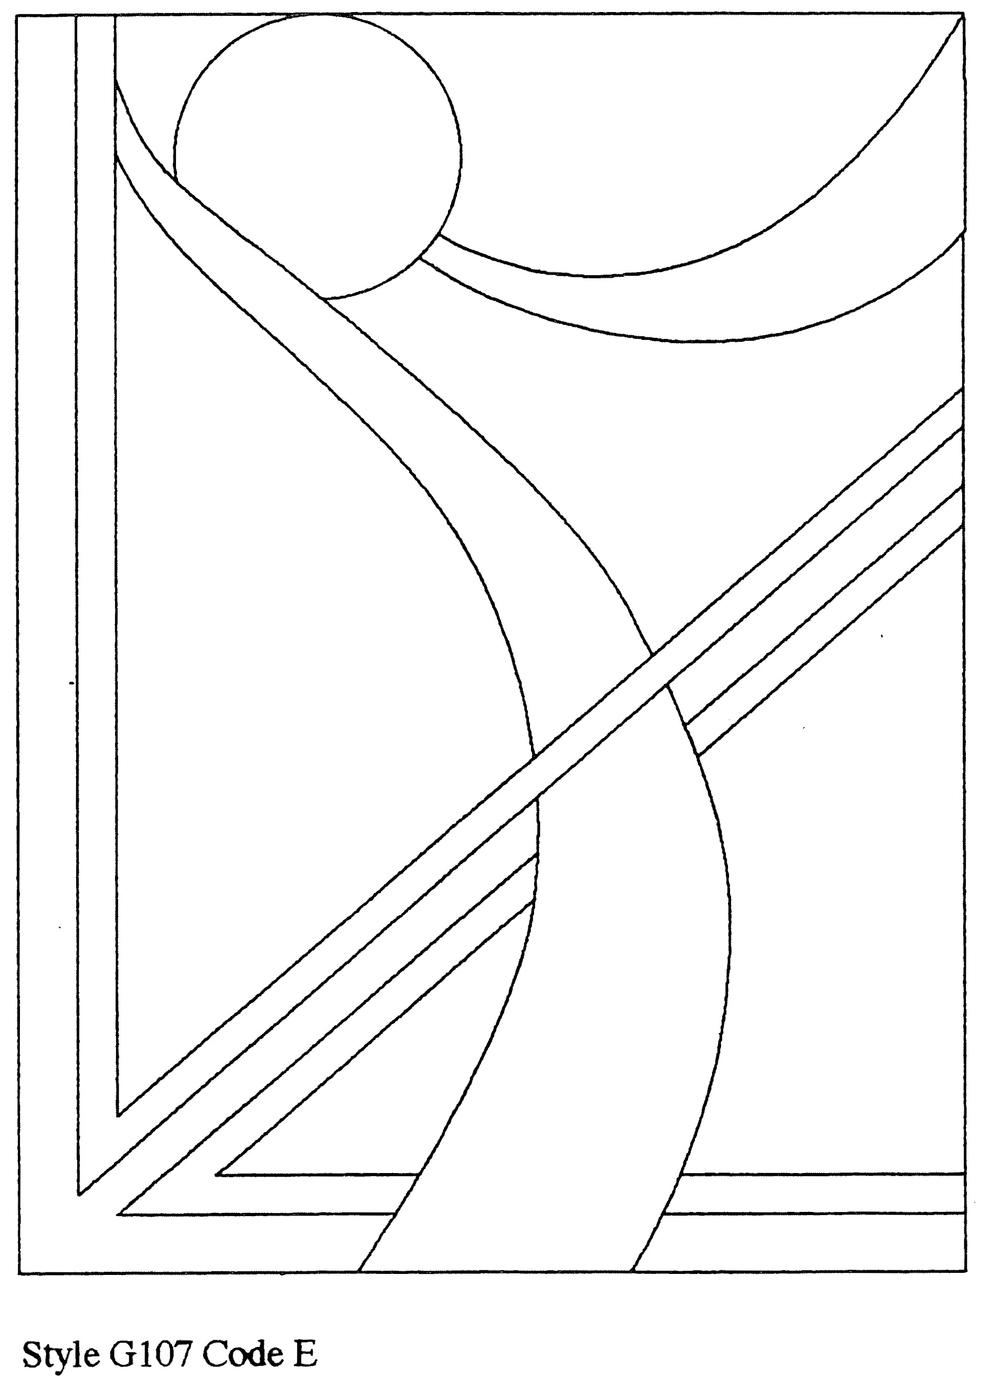 Page 1 copy.jpg